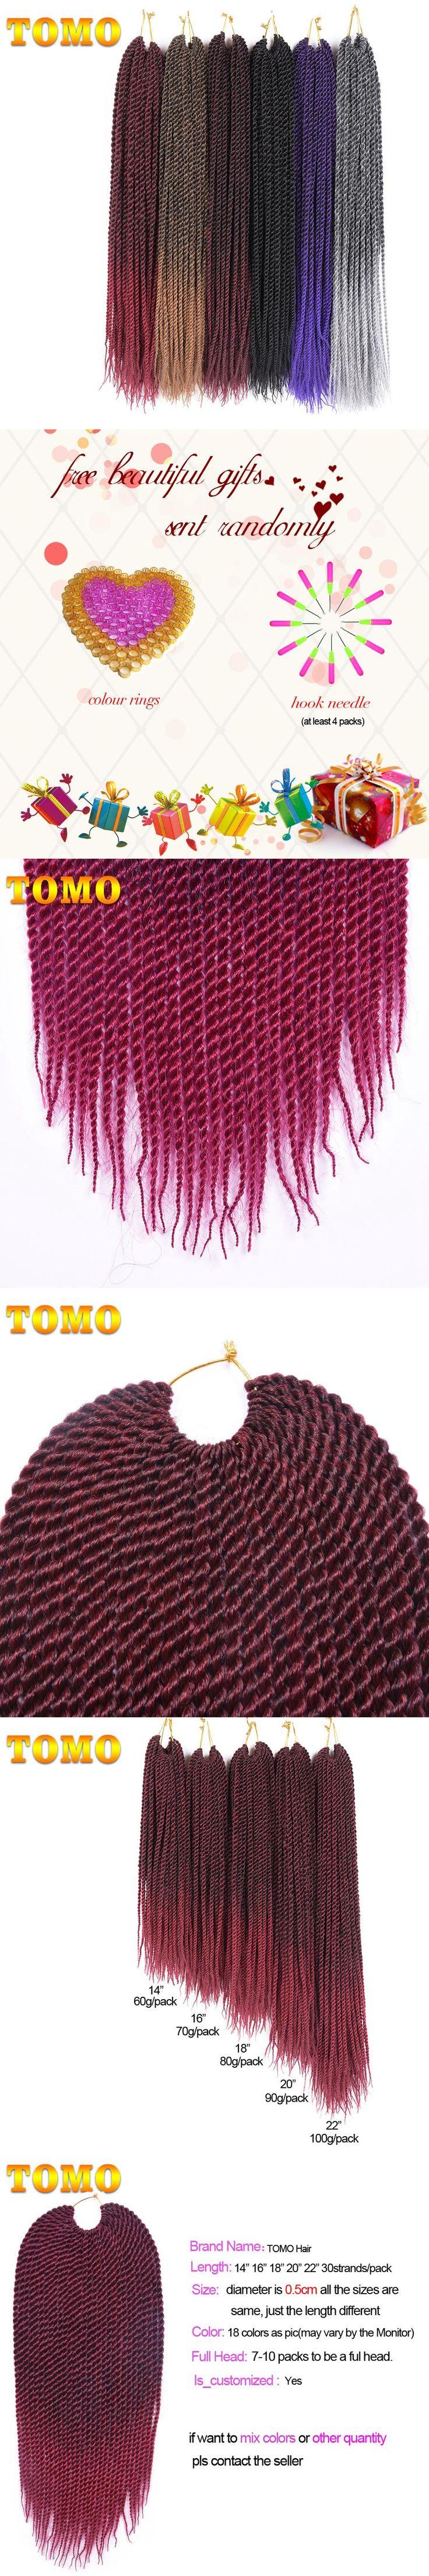 "TOMO Hair 30strands 14"" 16"" 18"" 20"" 22"" Havana Senegalese Twist Crochet Braids Ombre Kanekalon Braiding Hair Extensions 1 Pack"